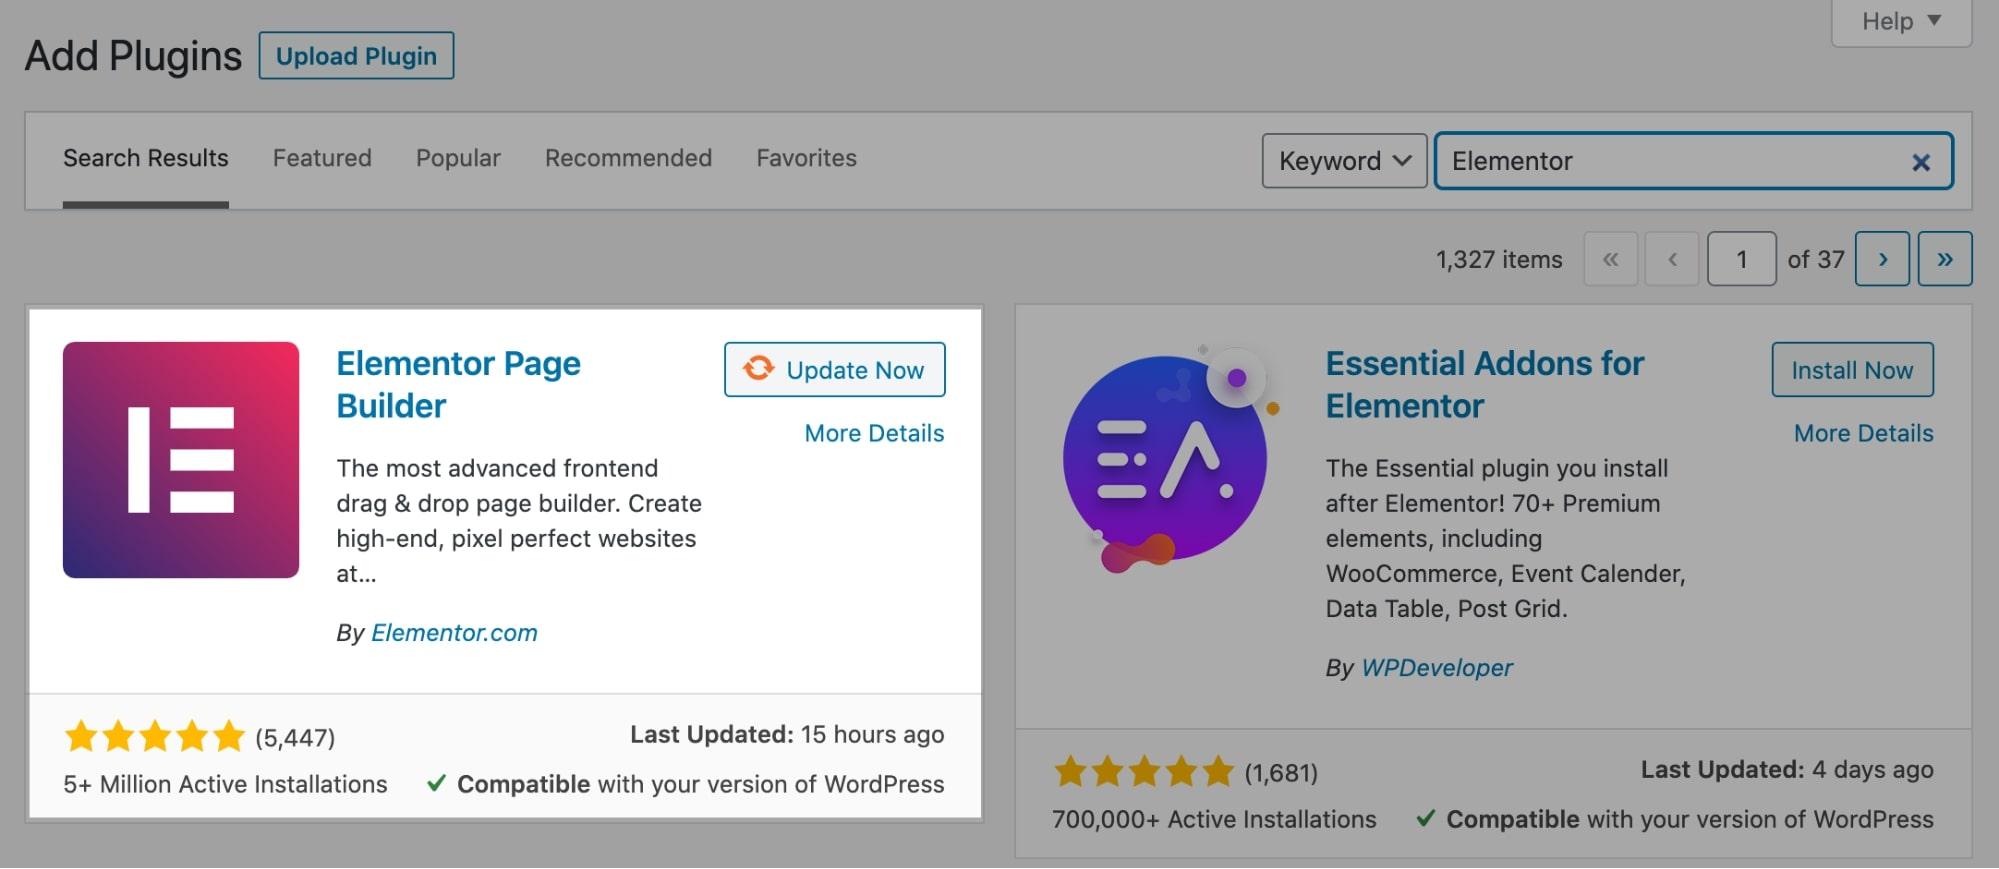 Elementor Install in WordPress